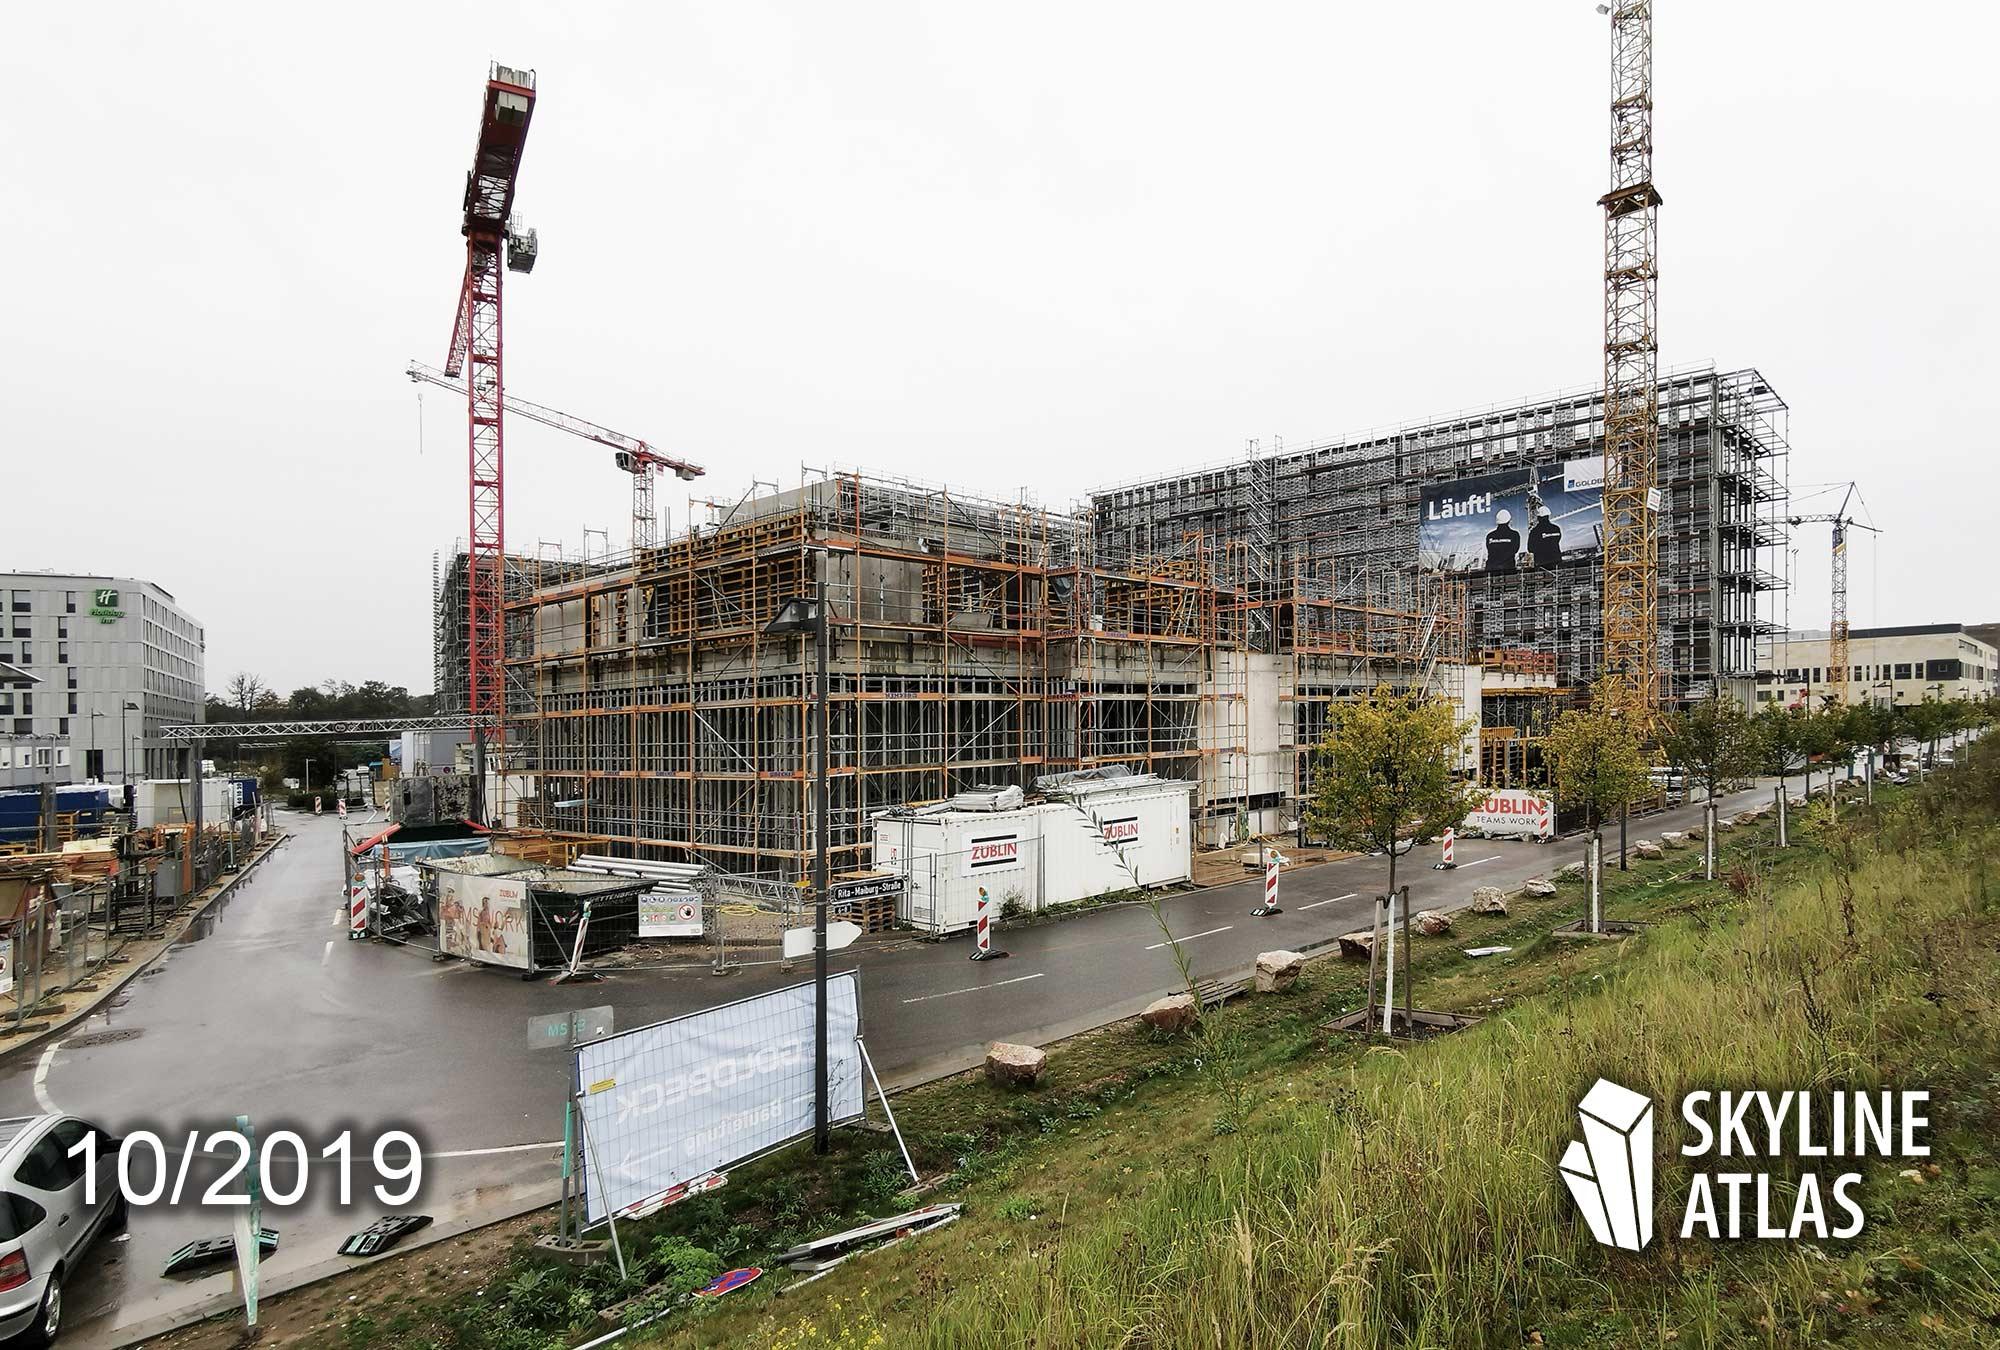 b'mine Hotel Frankfurt Airport - Carlift Hotel Frankfurter Flughafen - bmine Hotel Neubau Oktober 2019